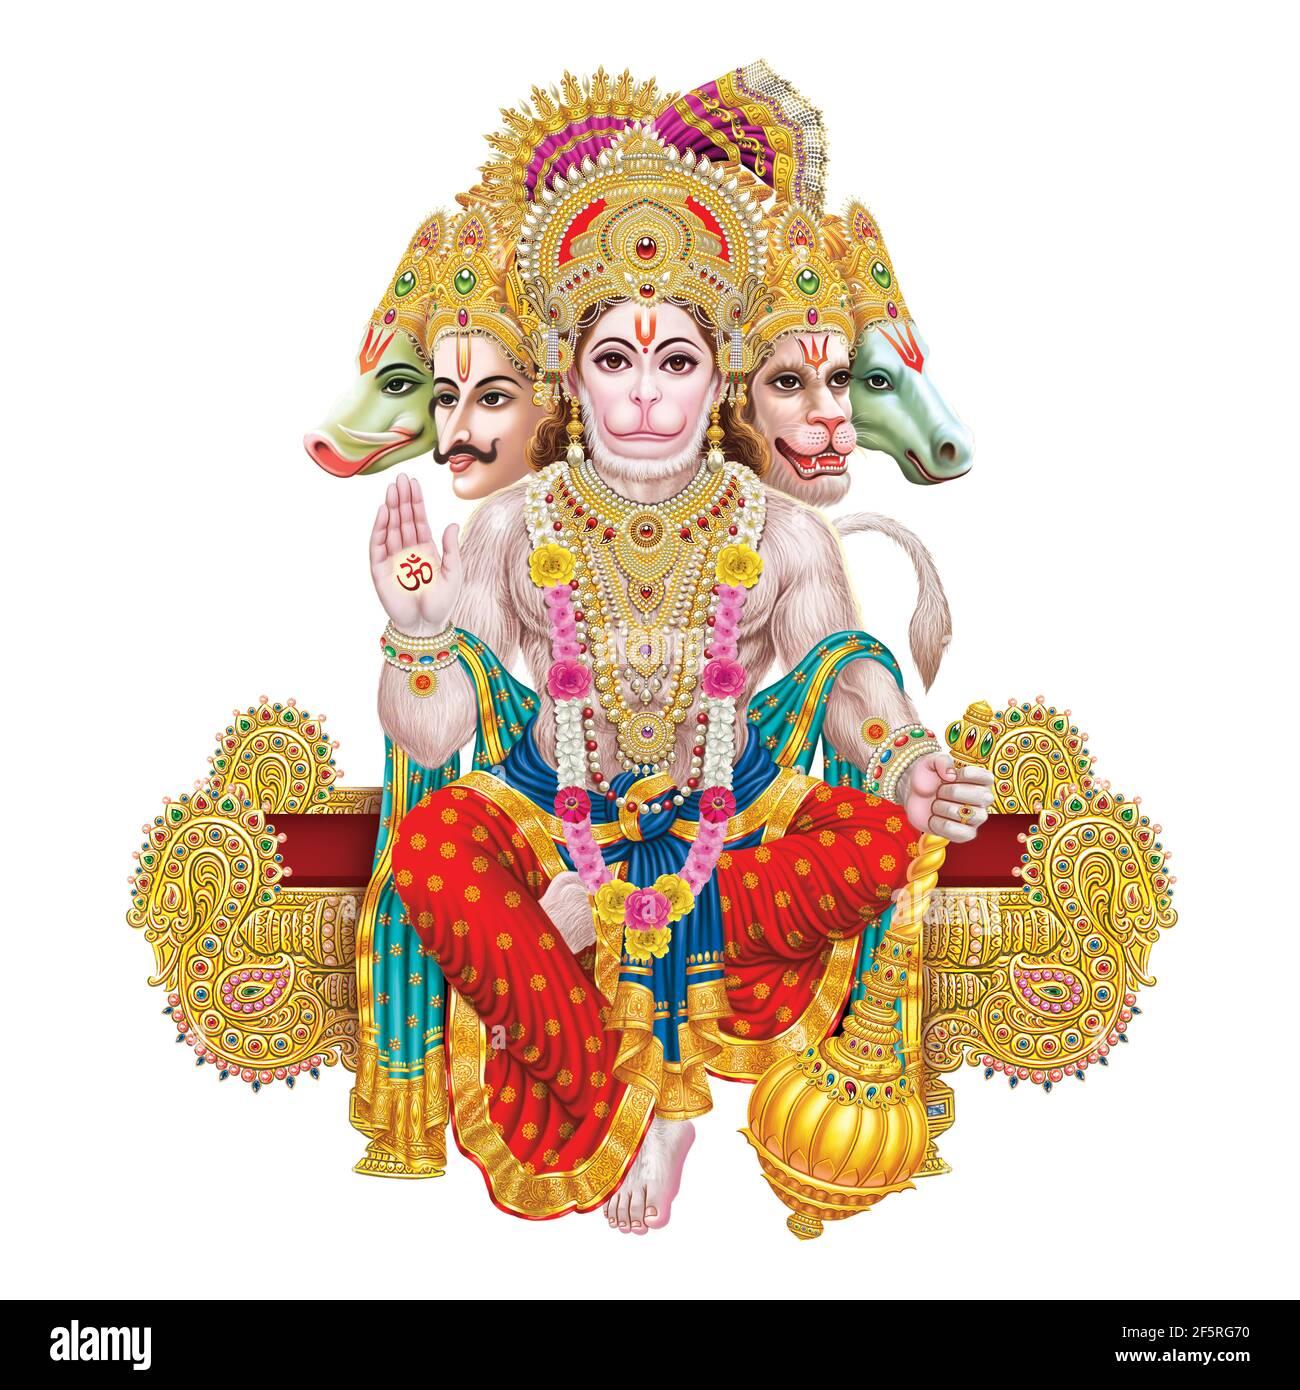 Hanuman High Resolution Stock Photography And Images Alamy